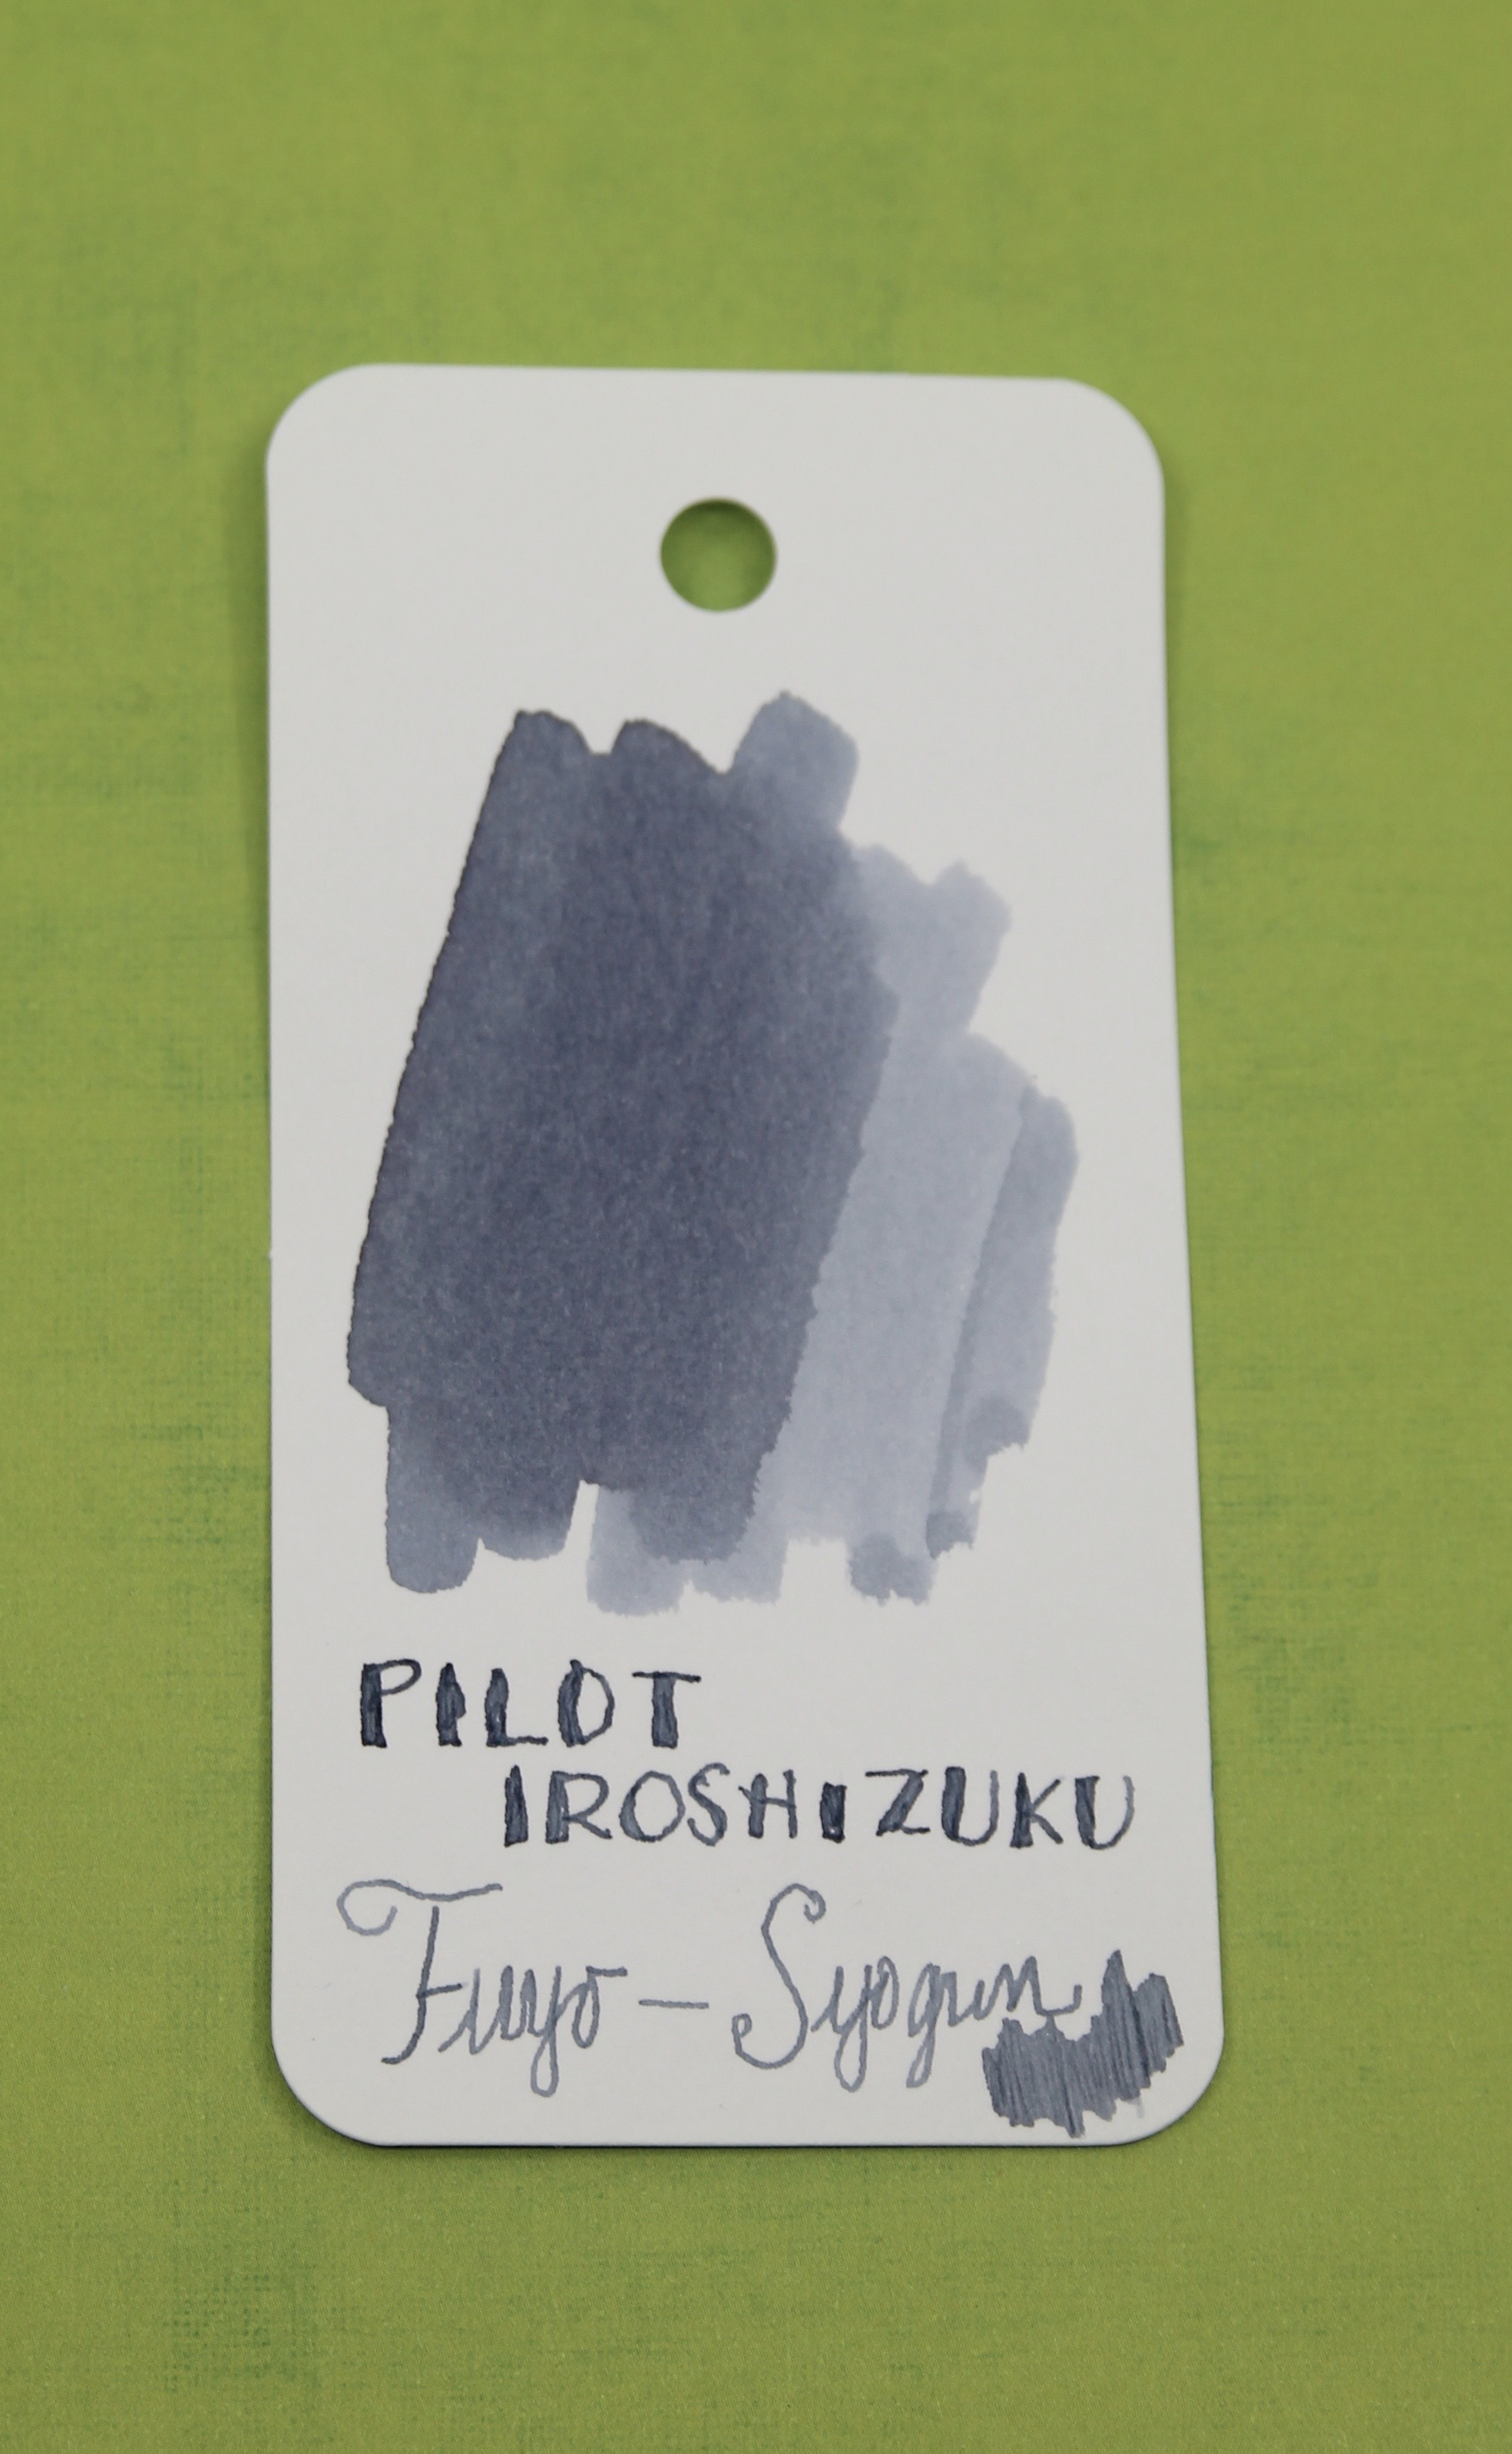 Ink Review Pilot Iroshizuku Fuyu Syogun The Well Appointed Desk